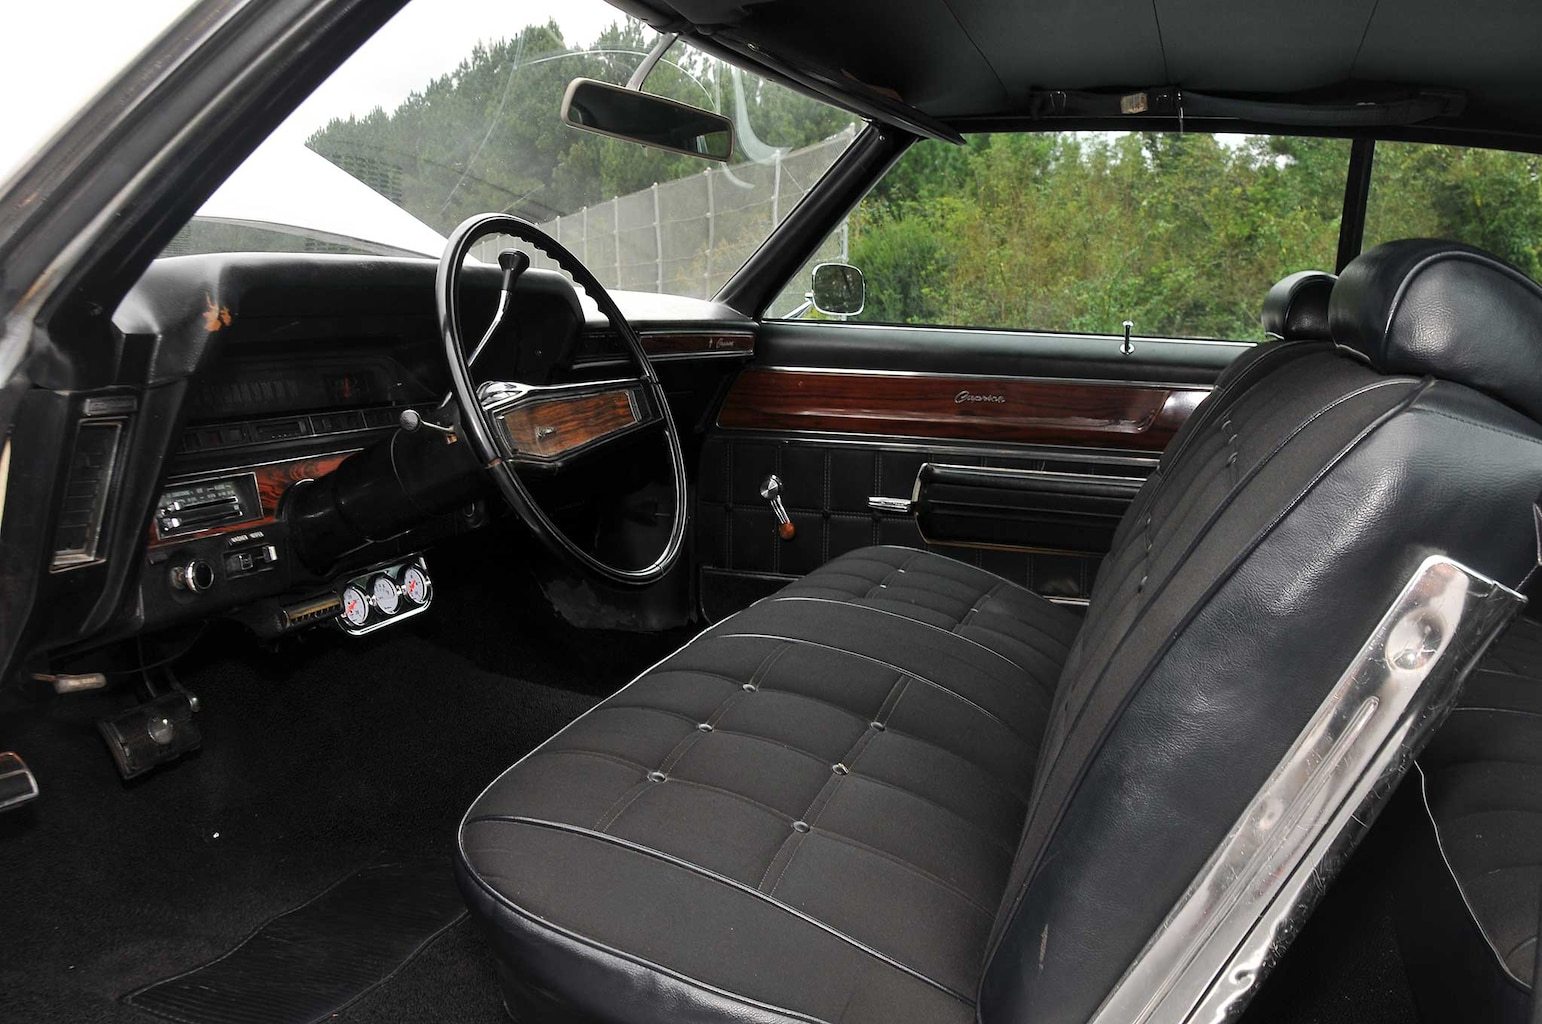 1970 chevrolet caprice interior 009